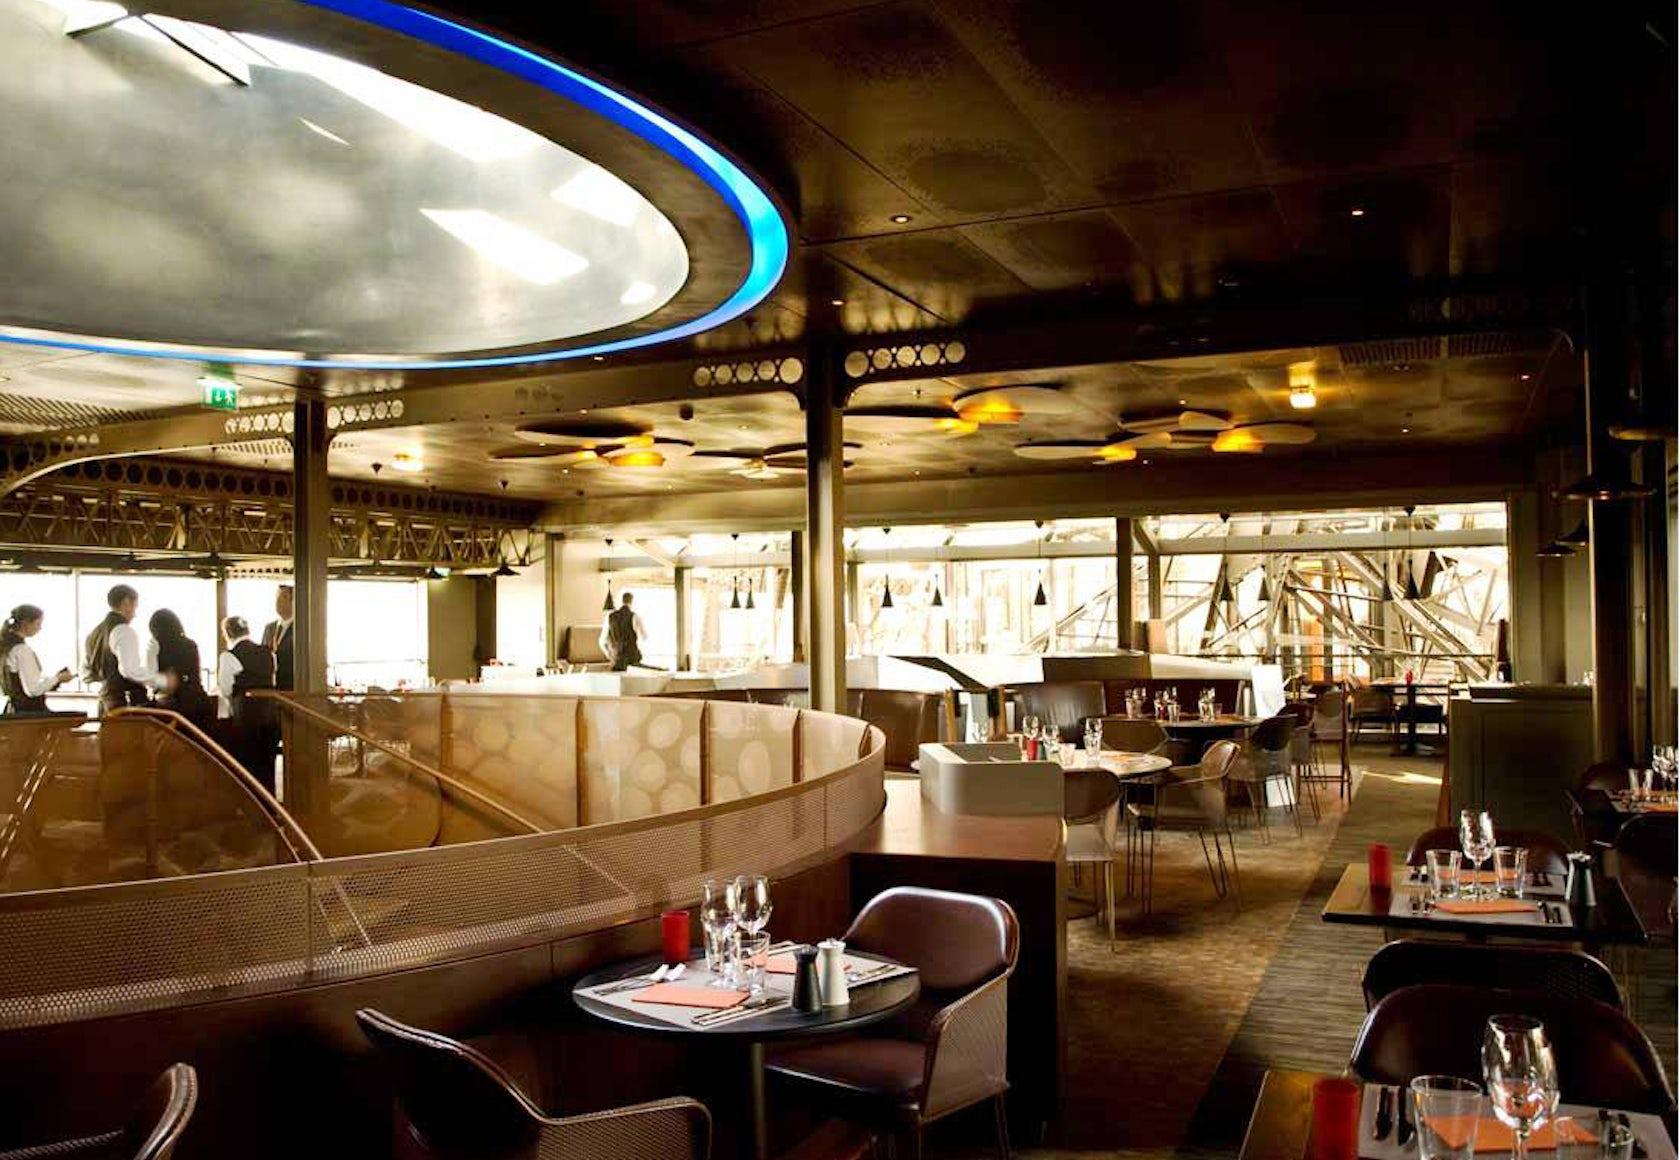 eiffel tower restaurant architizer. Black Bedroom Furniture Sets. Home Design Ideas